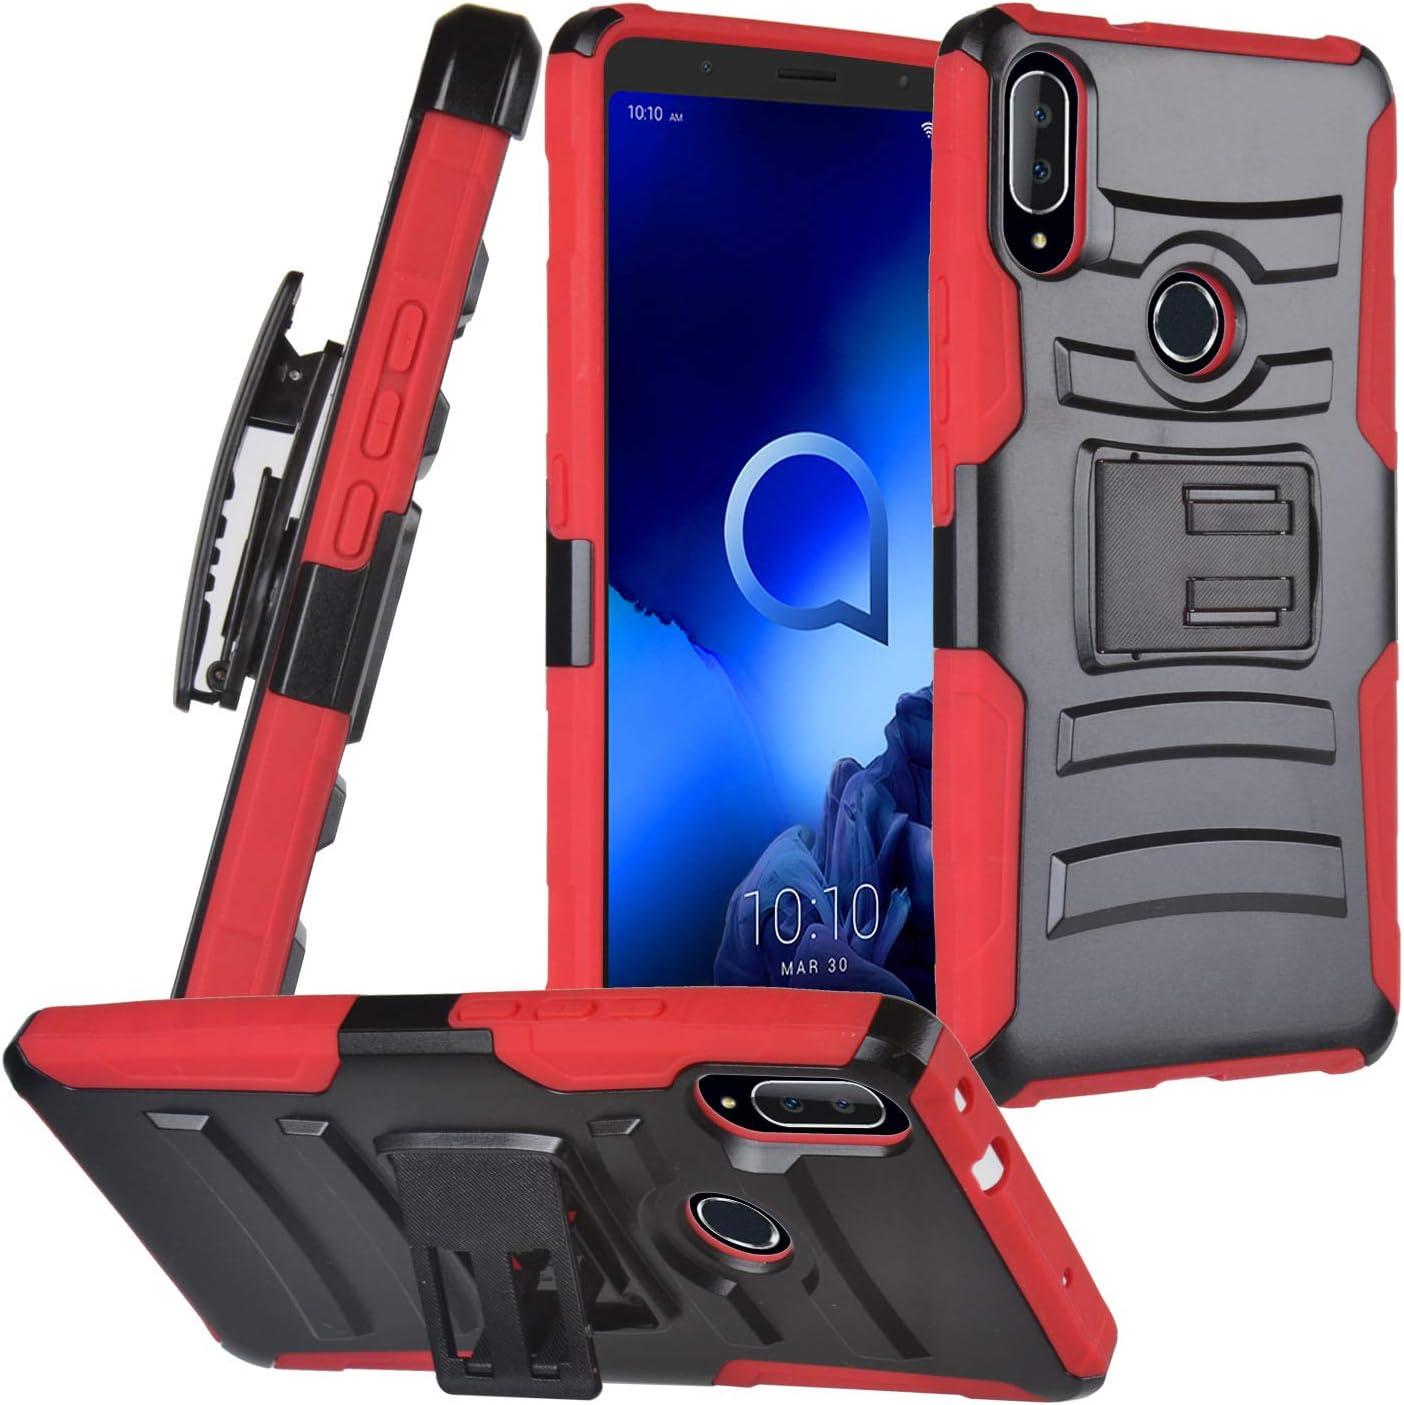 CELZEN - for Alcatel 3V (2019) 5032W - Hybrid Phone Case w/Stand/Belt Clip Holster - CV1 Red